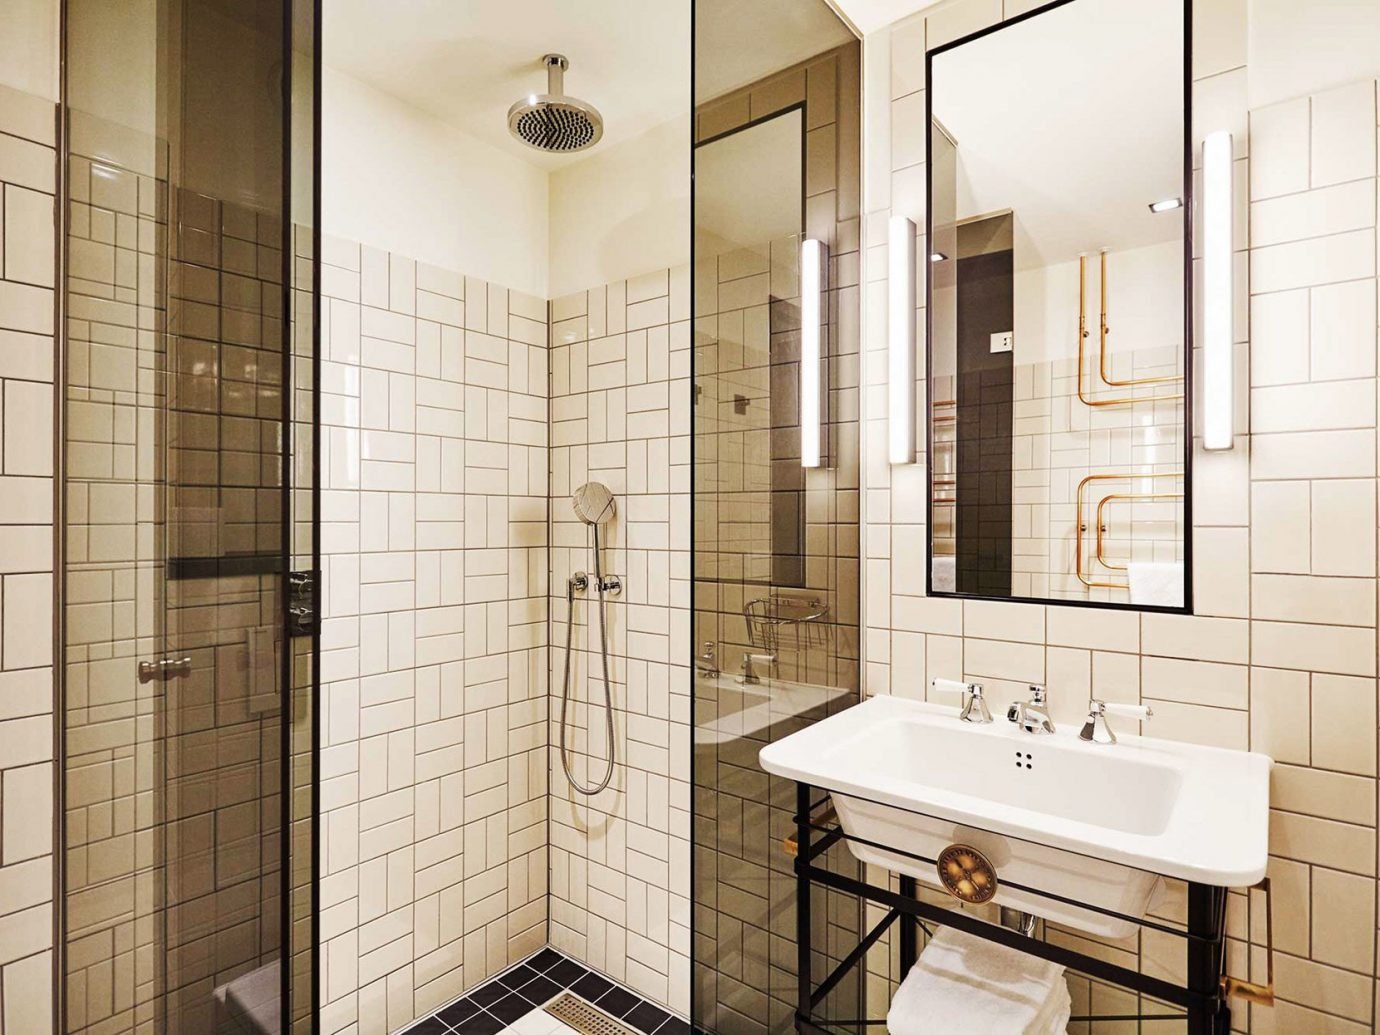 Amsterdam Boutique Hotels Hotels The Netherlands bathroom indoor wall room property sink floor plumbing fixture interior design flooring tile estate apartment tiled tan